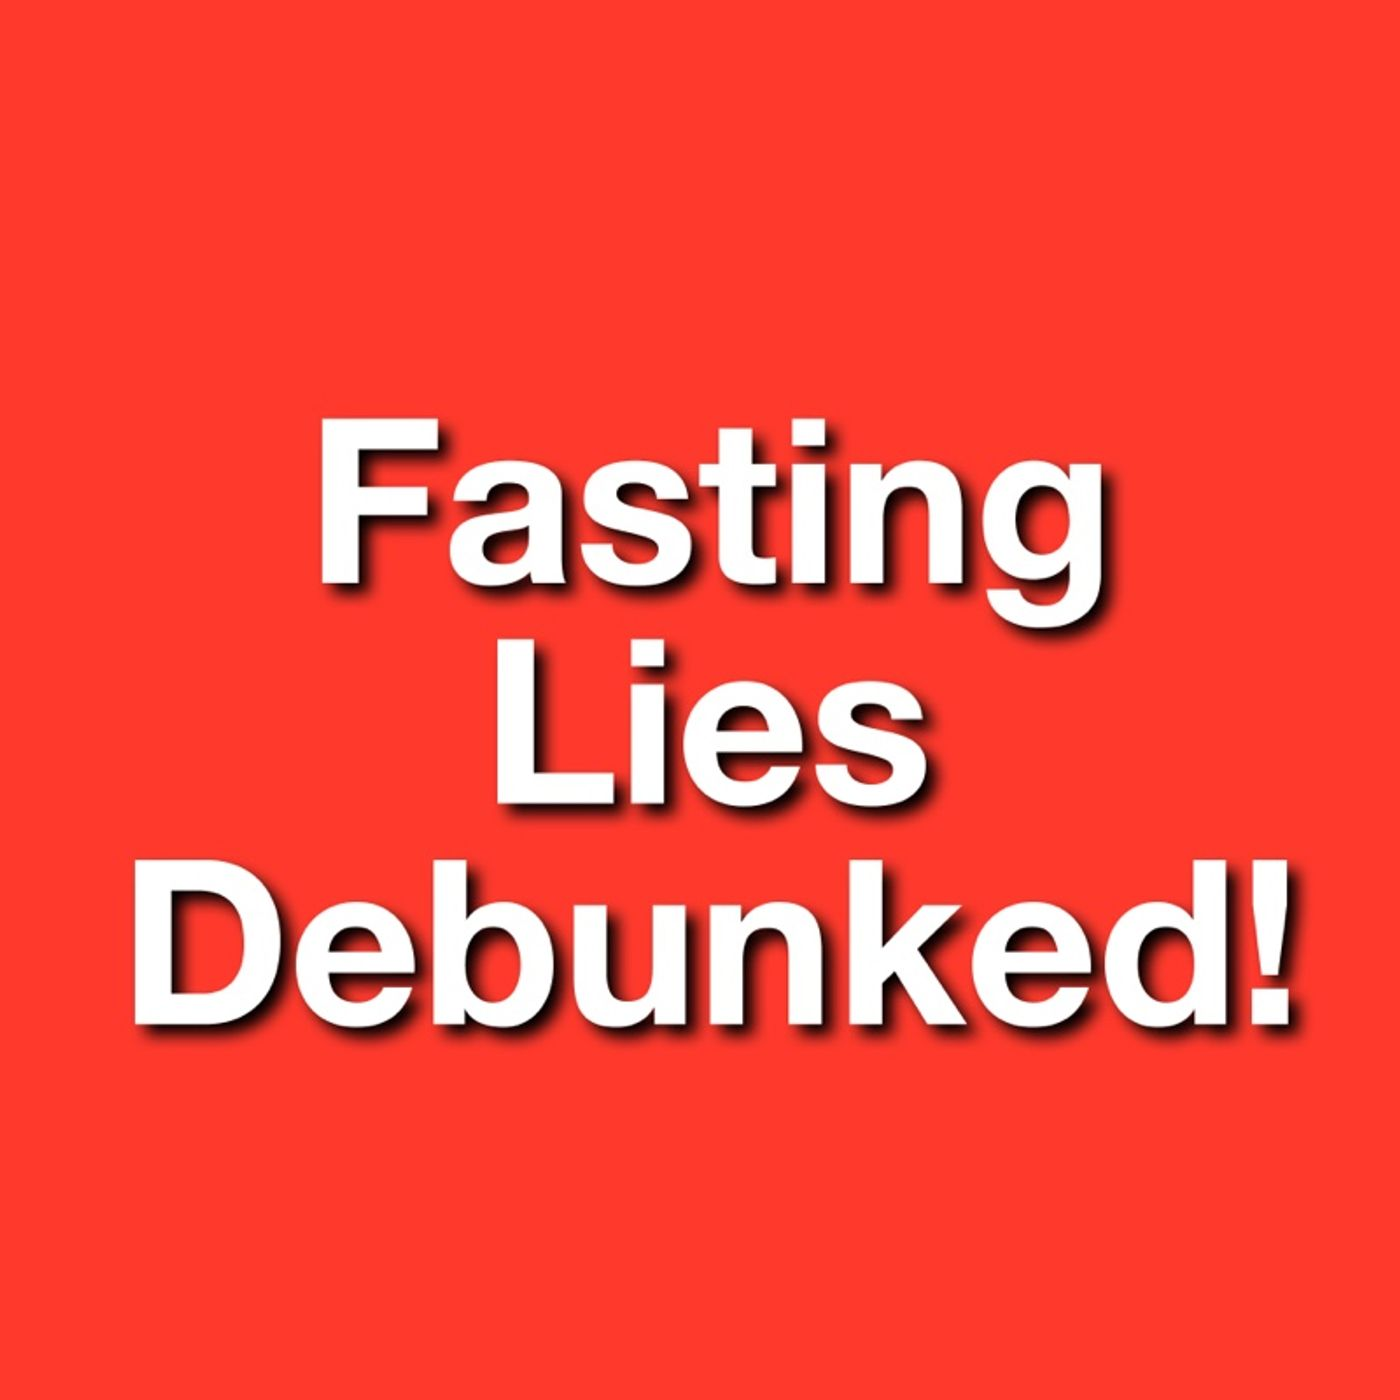 171- 5 Fasting Lies Debunked